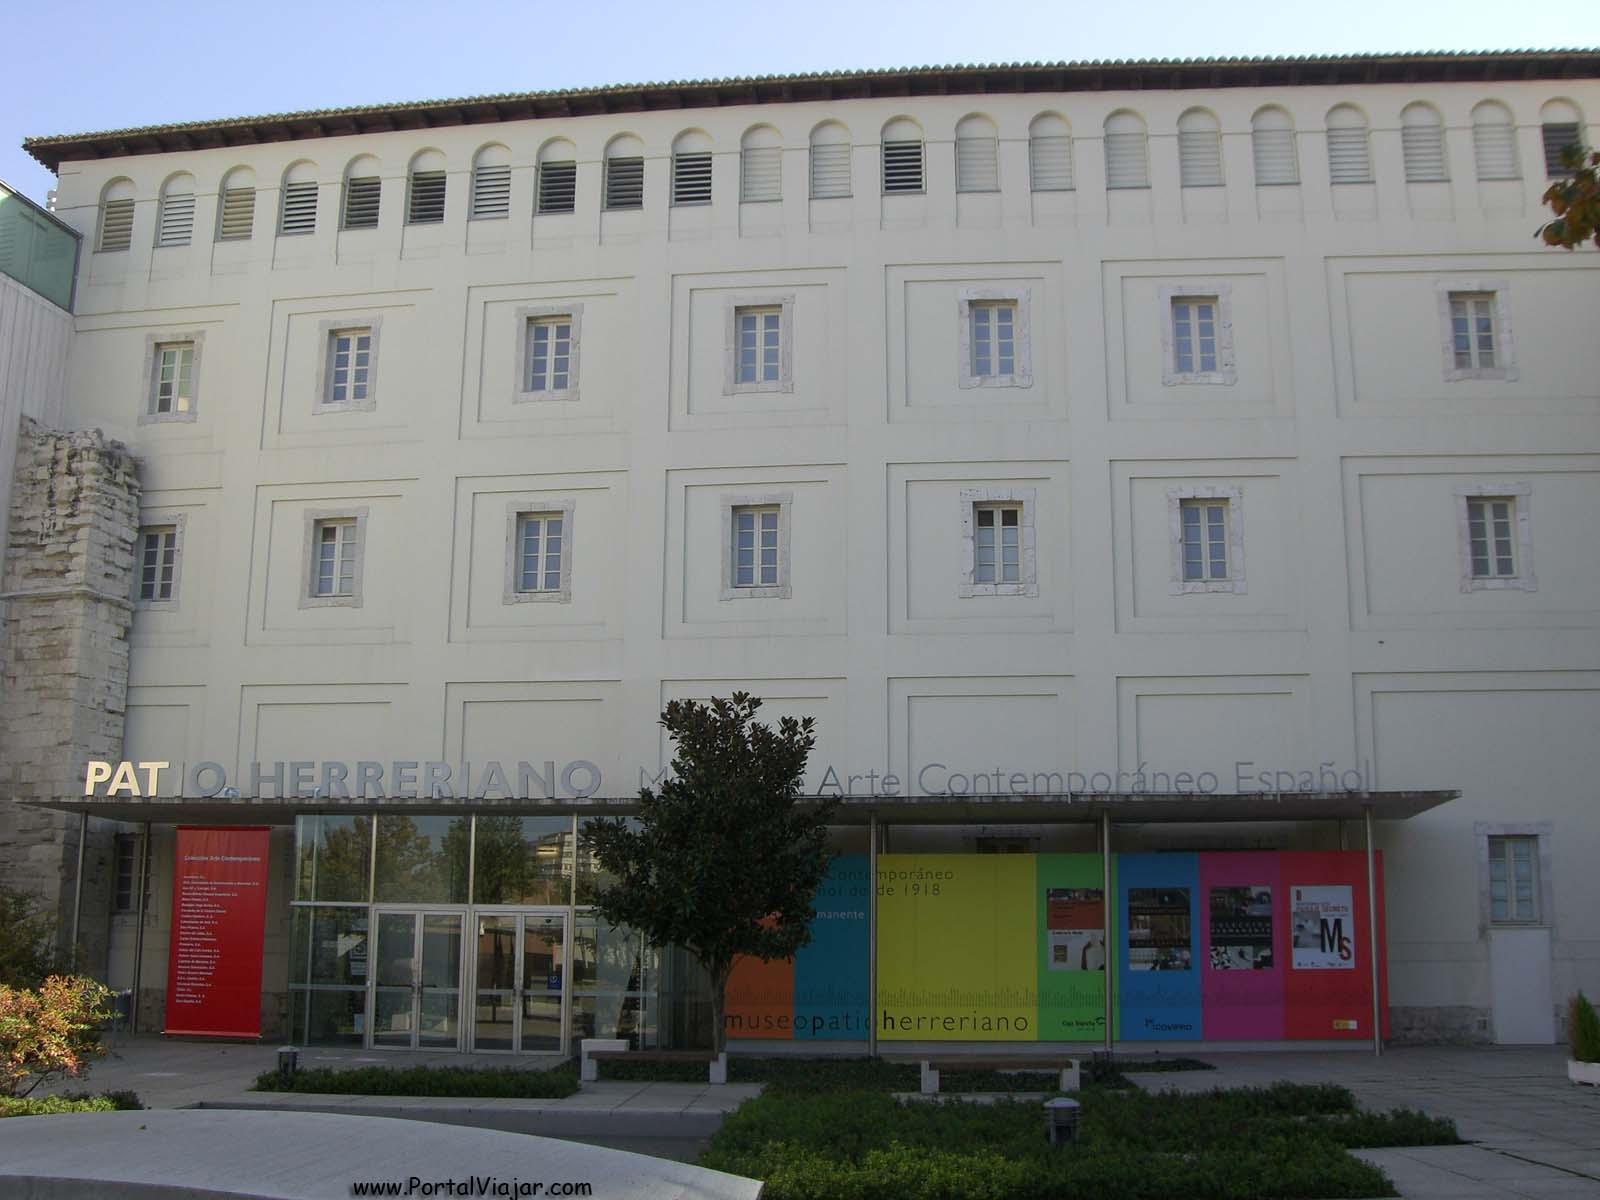 Patio Herreriano (Valladolid)